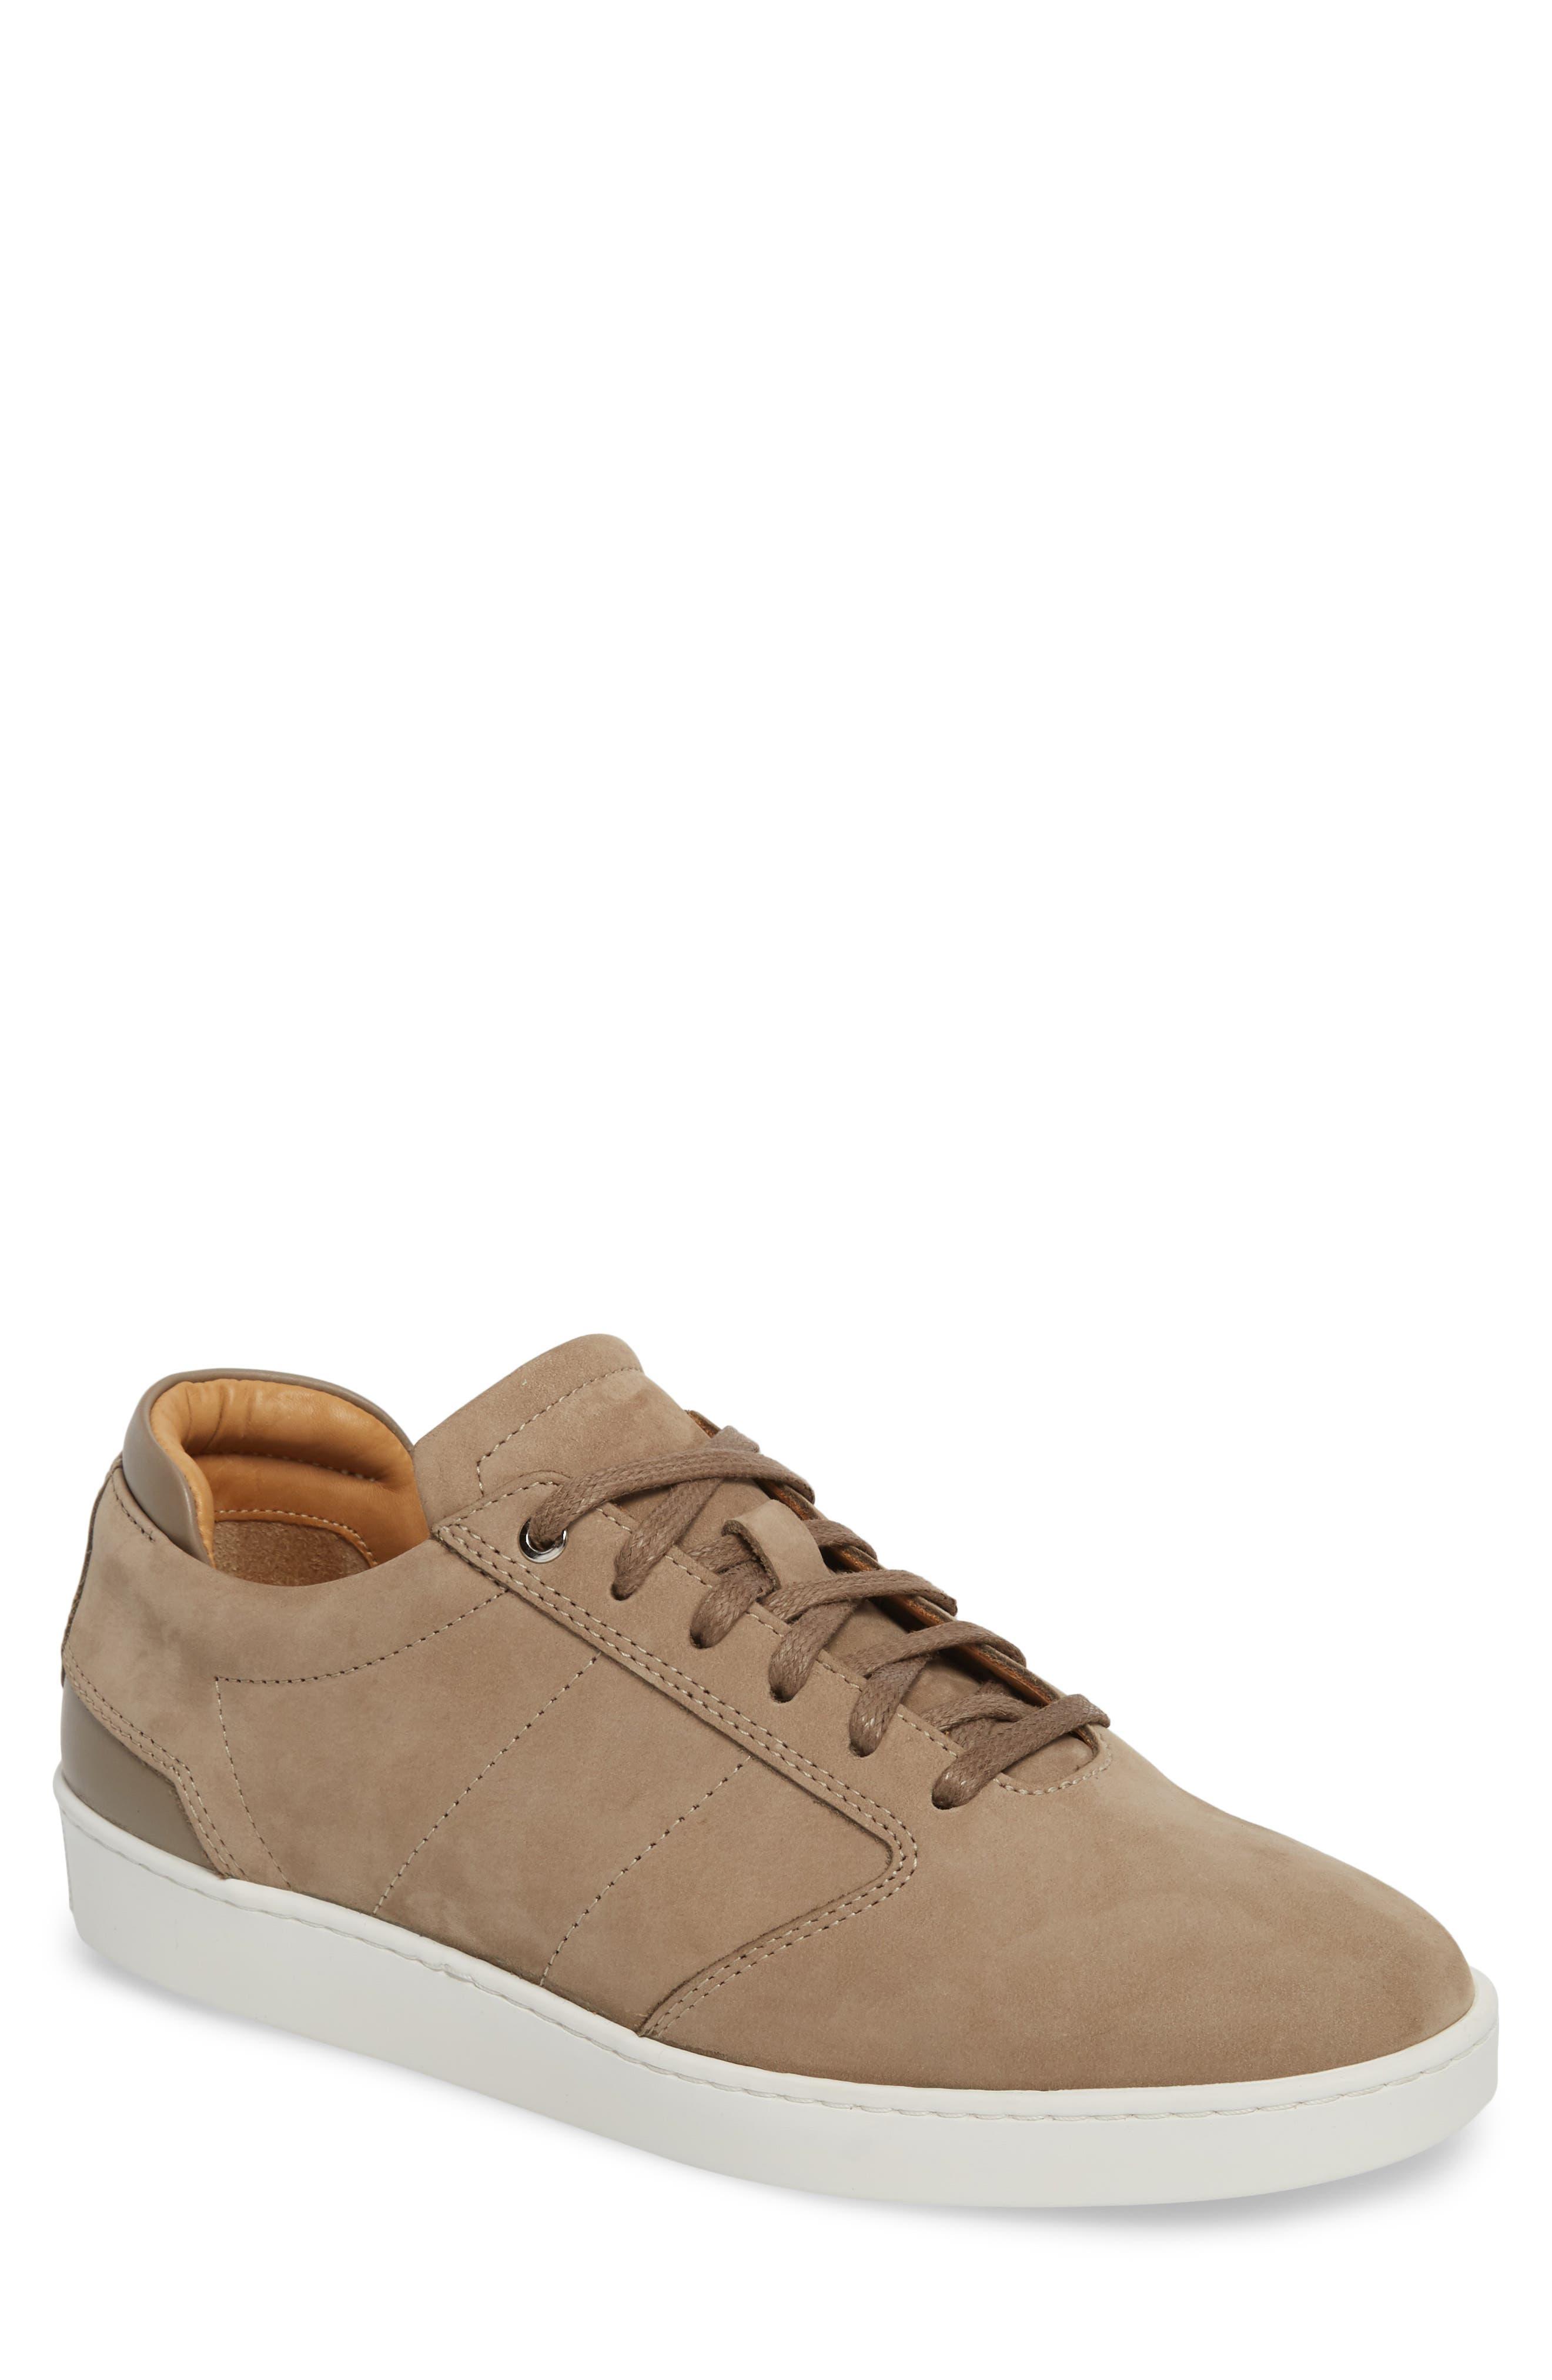 Lennon Sneaker,                         Main,                         color, Woodsmoke/ Mushroom